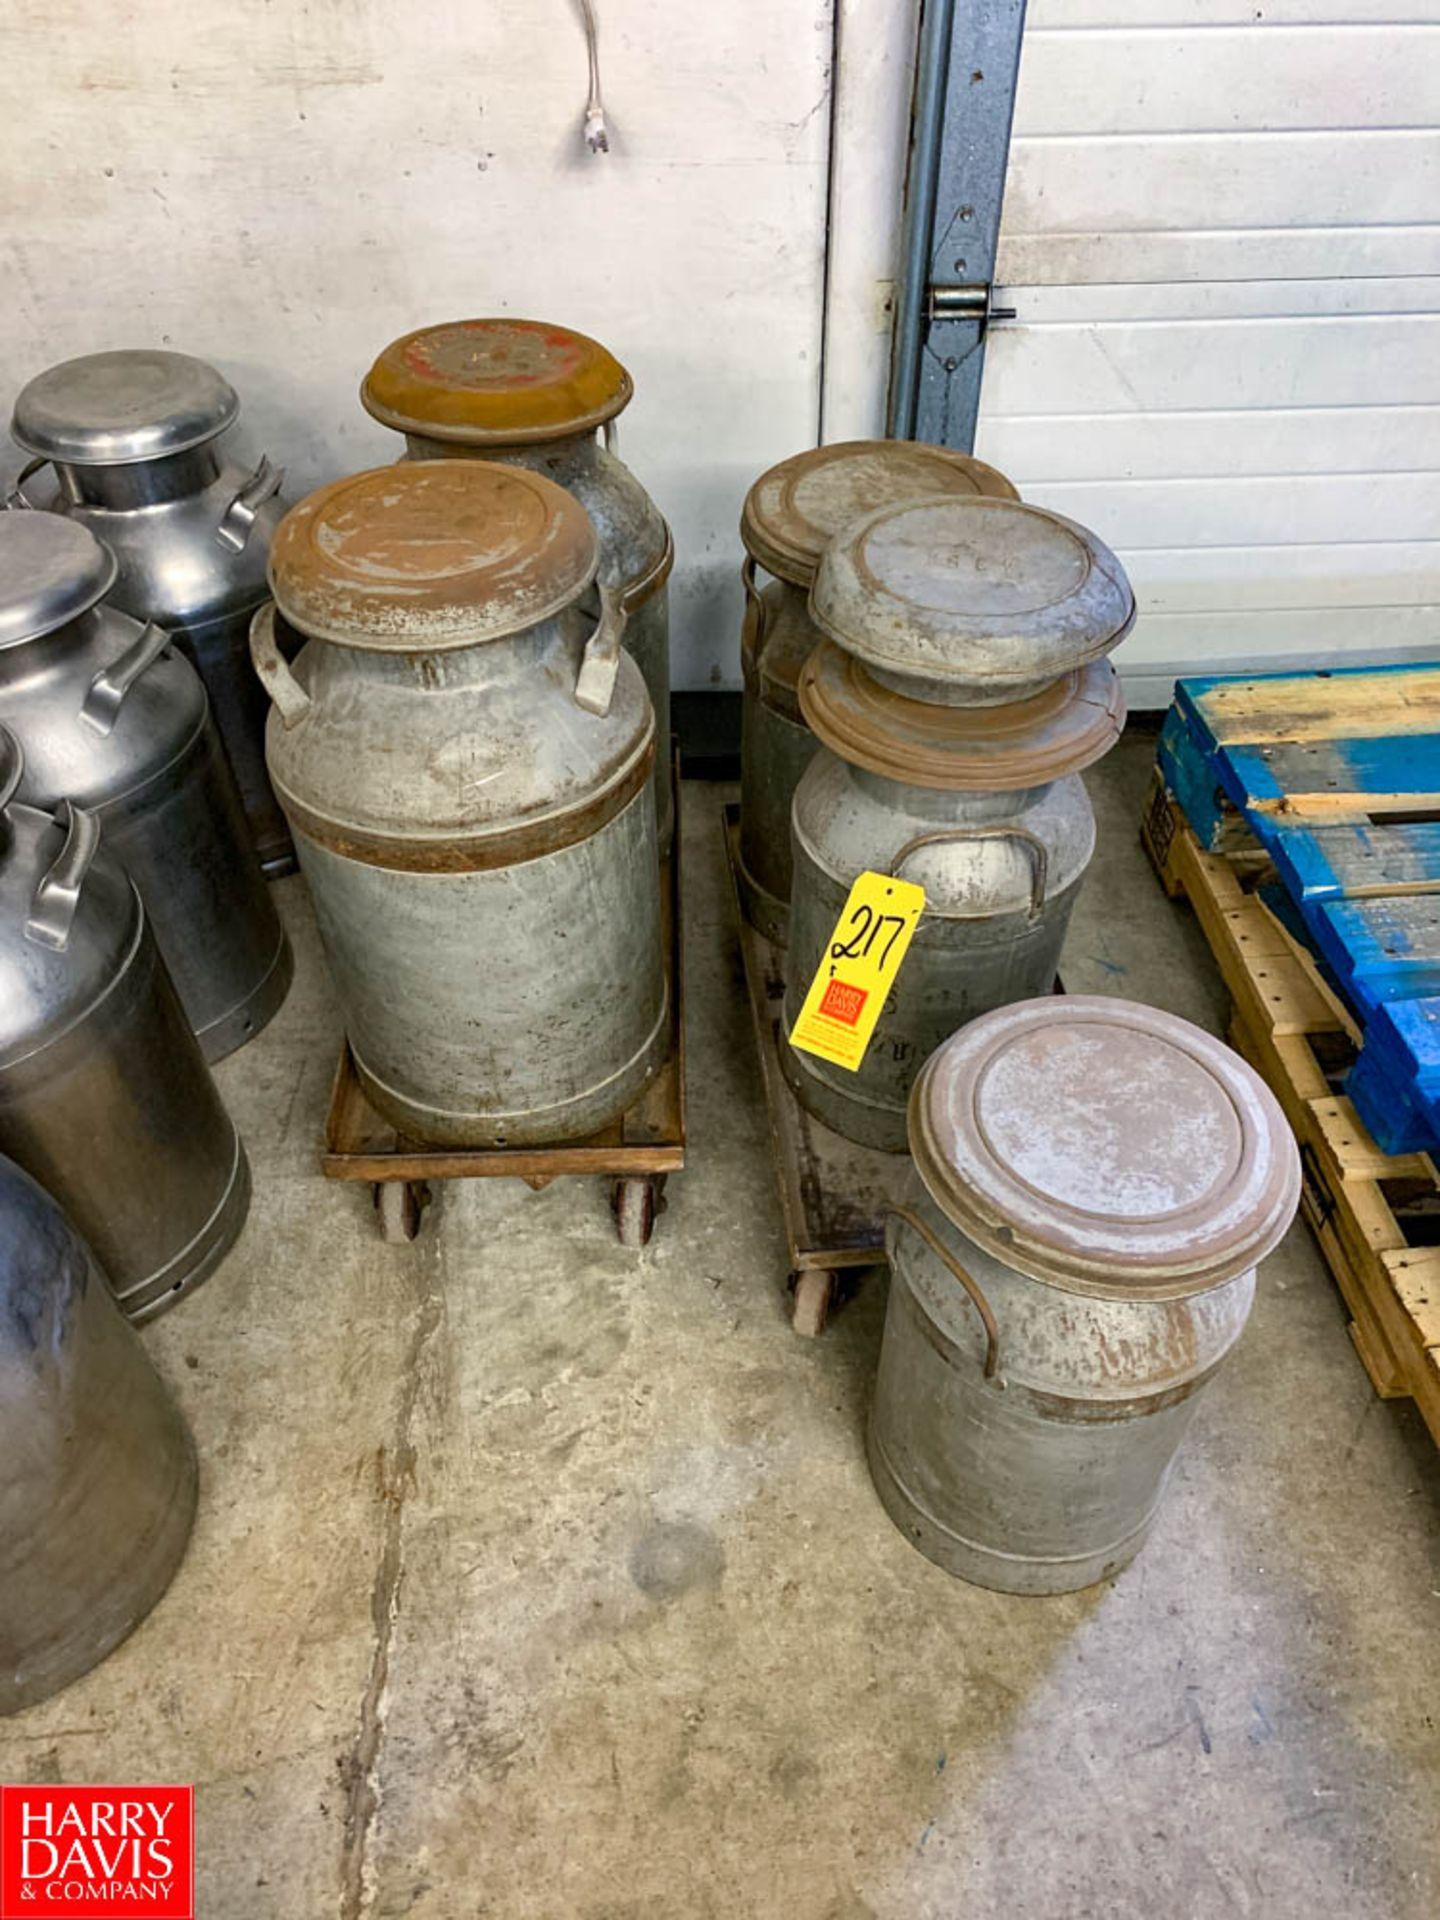 10 Gallon and 5 Gallon Milk Cans